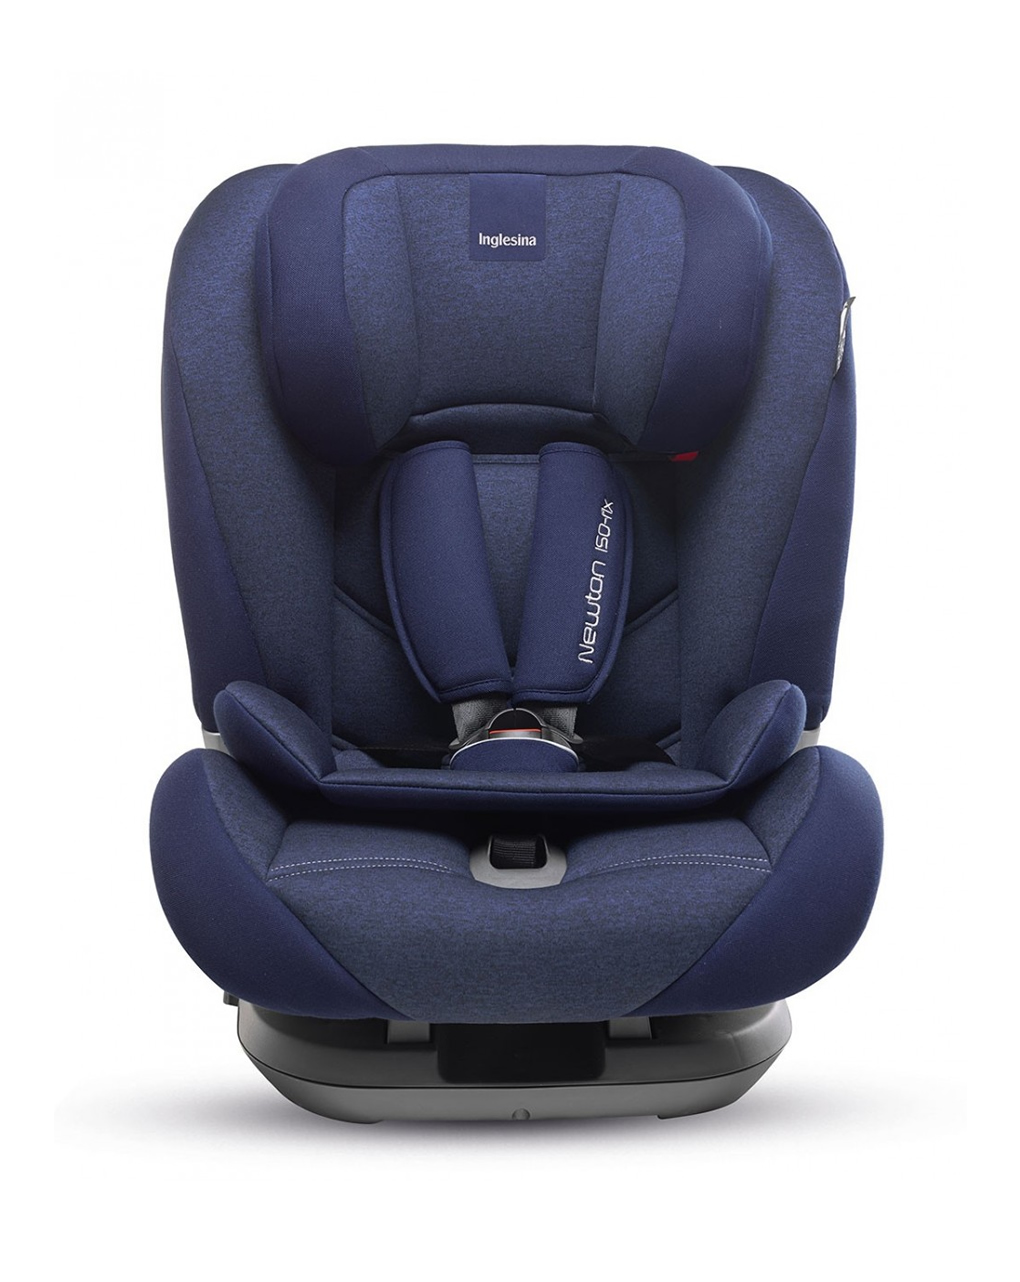 Cadeira auto inglesina newton 1.2.3 ifix, marinho - Inglesina